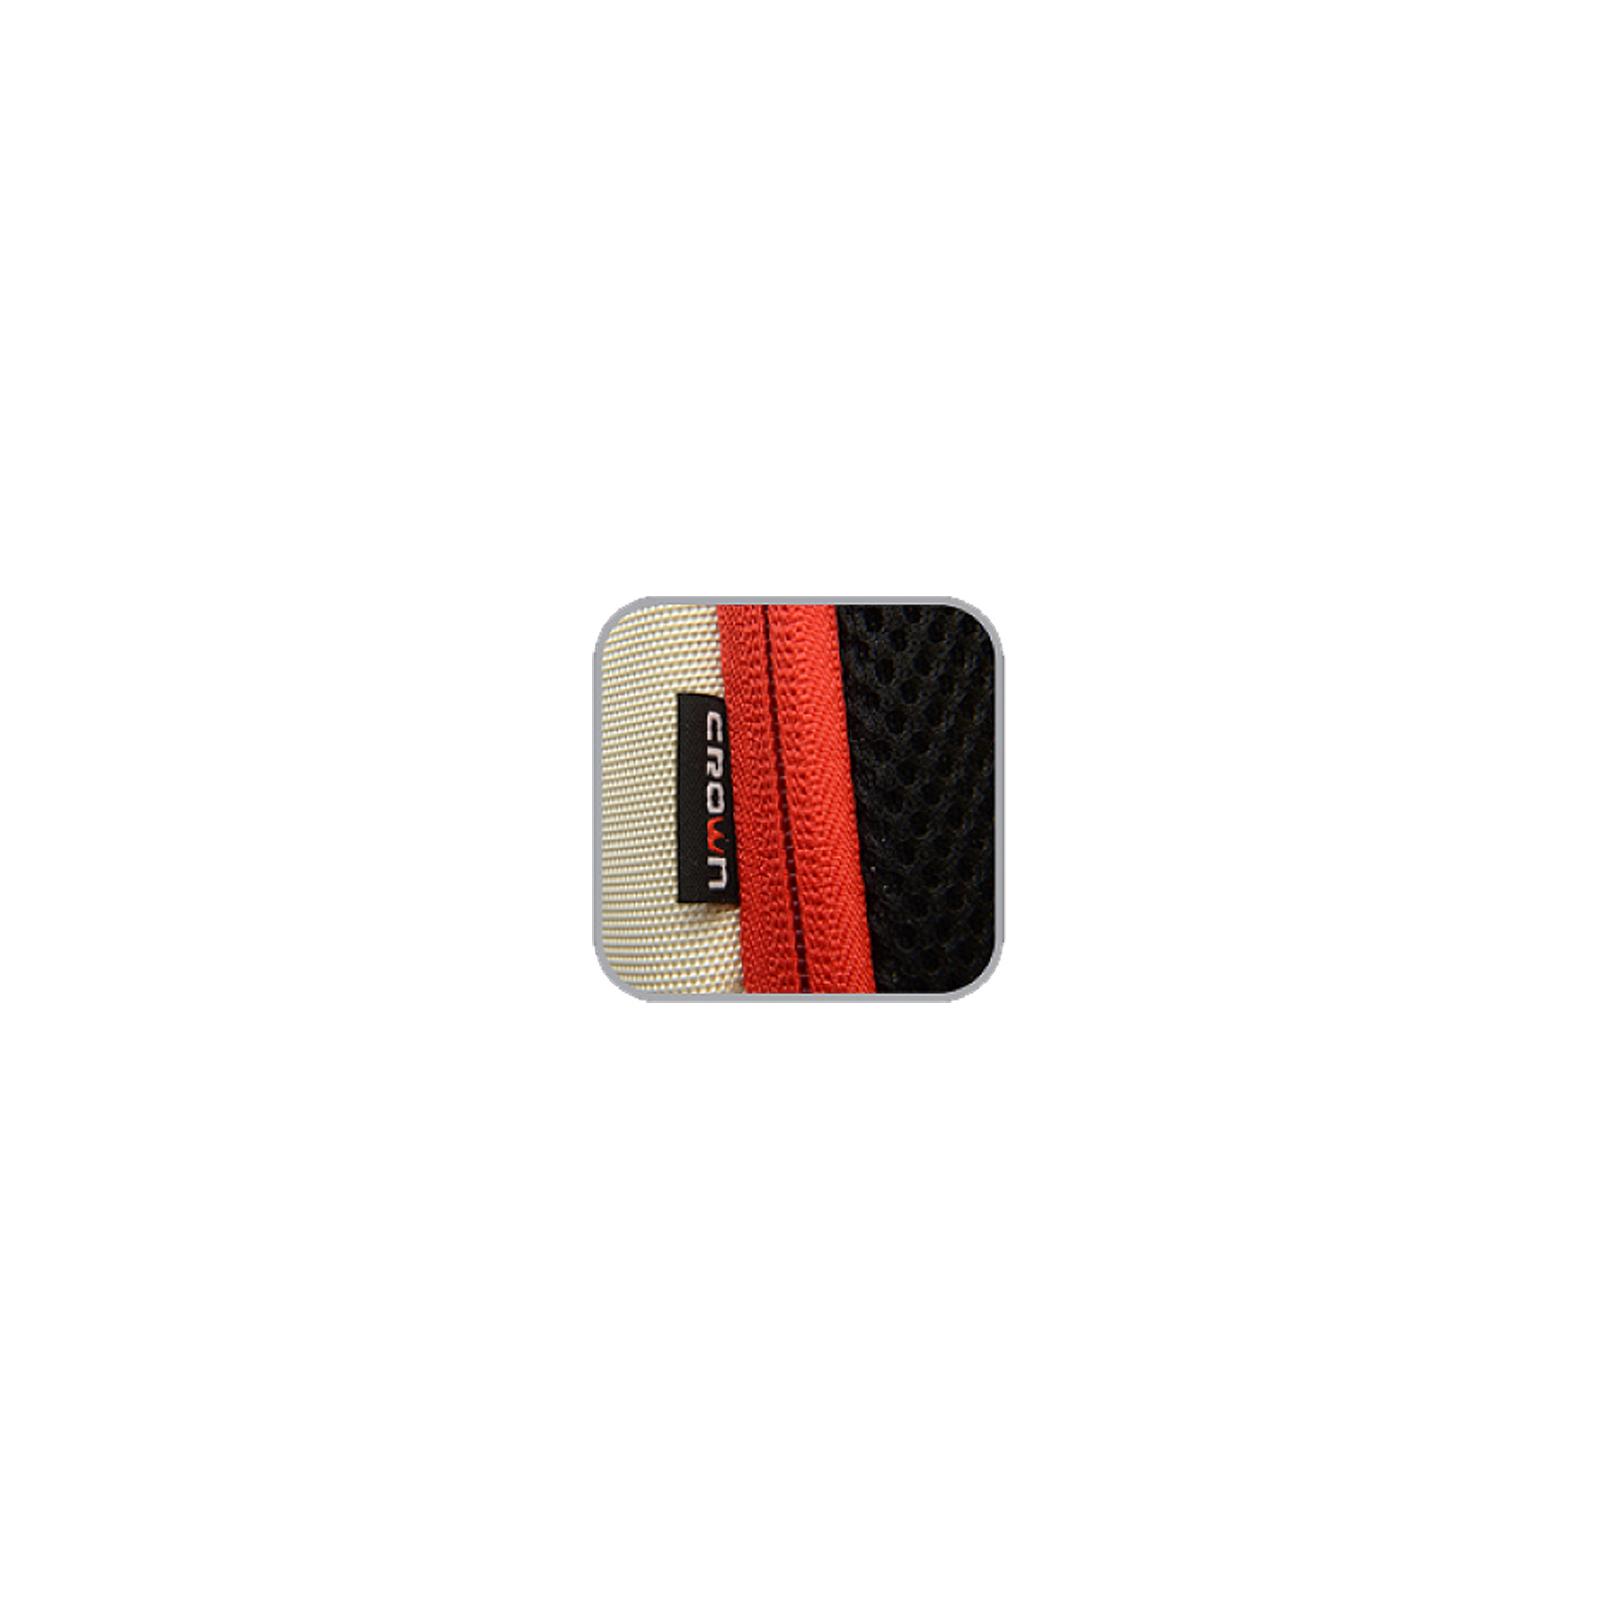 Рюкзак для ноутбука Crown 15.6 Harmony black and red (BPH3315BR) изображение 5